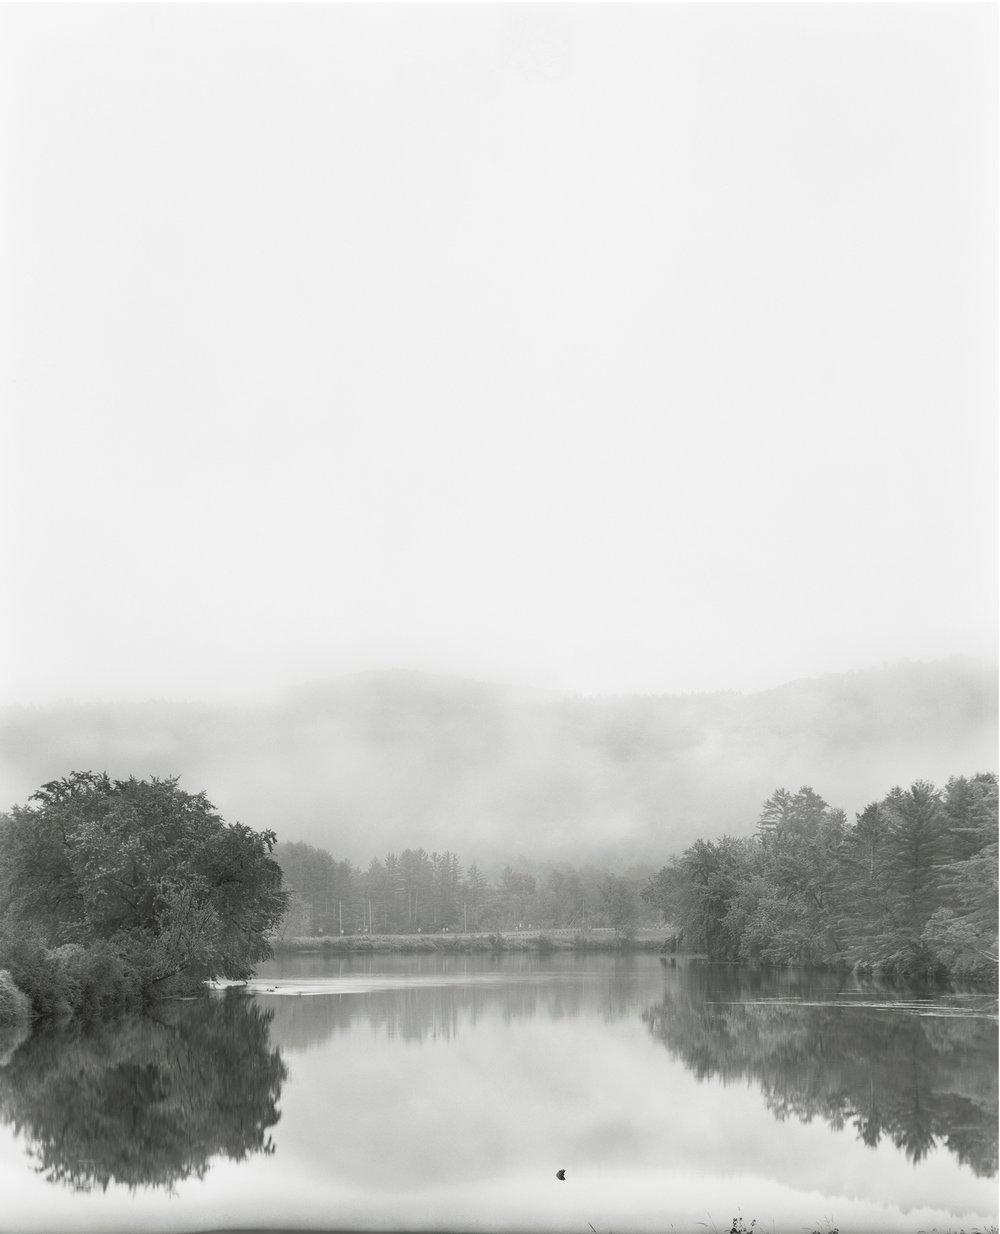 Elvira_Piedra_The Great River, Vermont.jpg